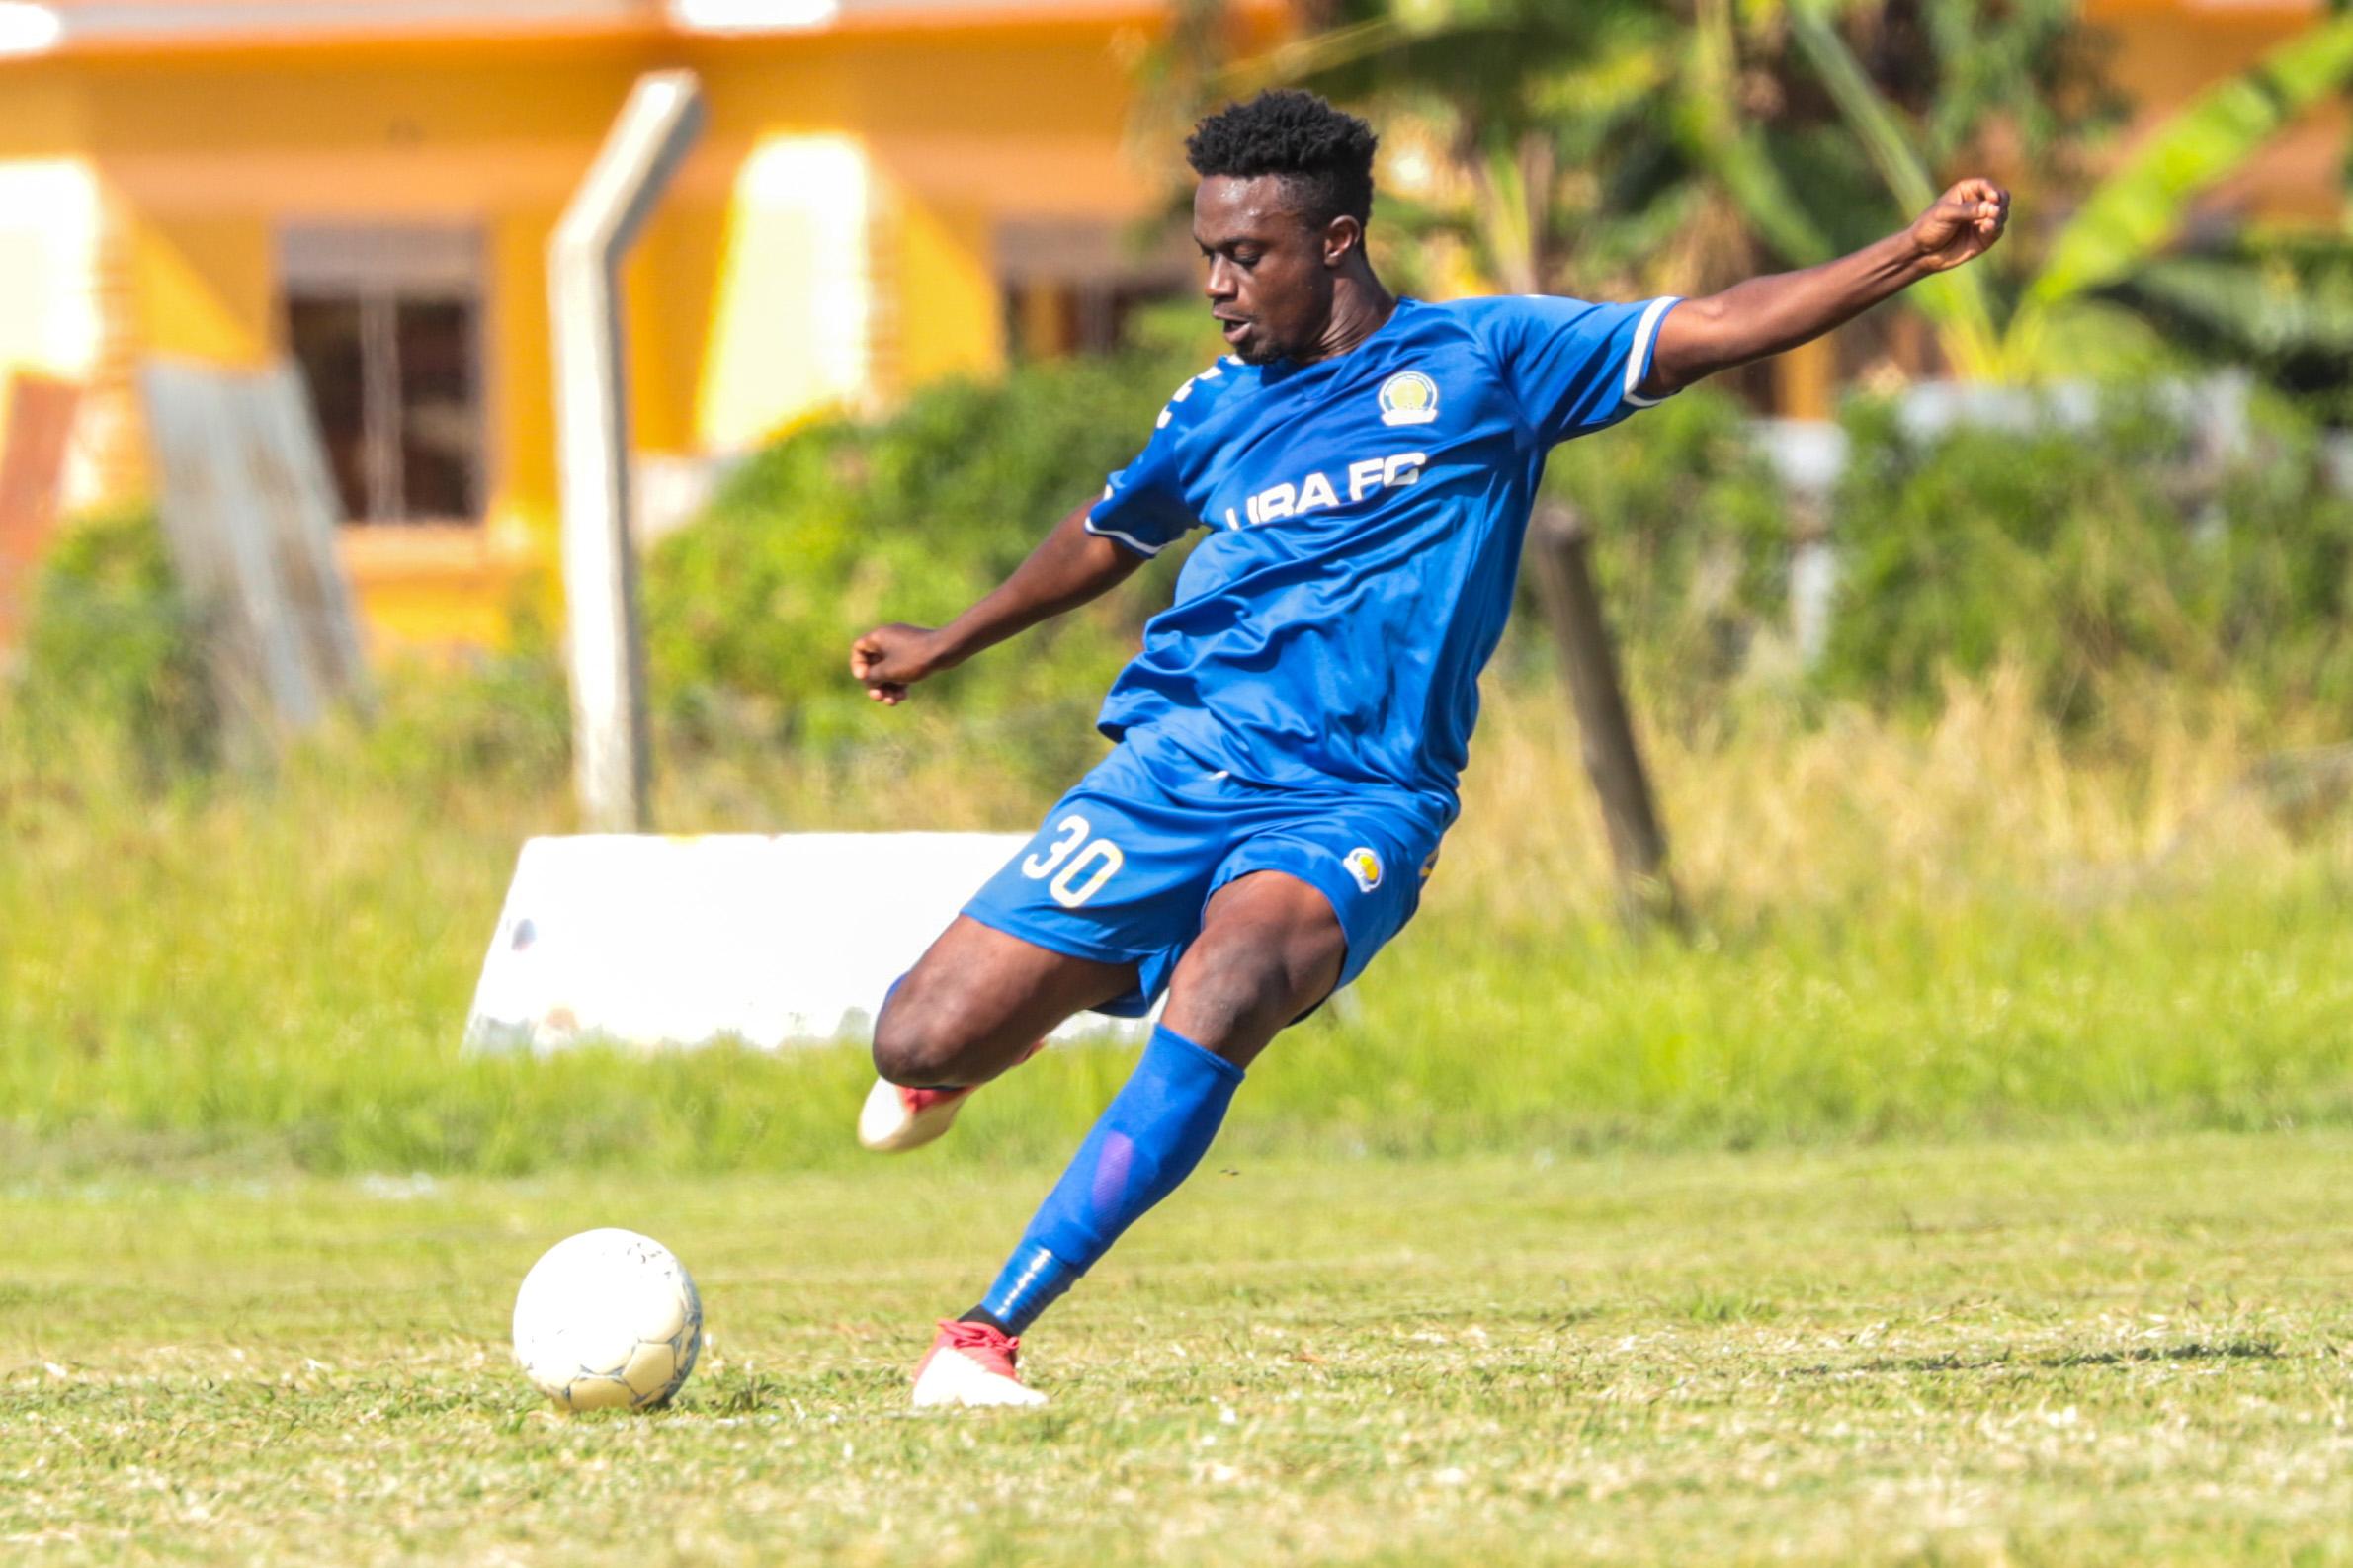 MATCH REPORT: Mbarara City 0 URA FC 1